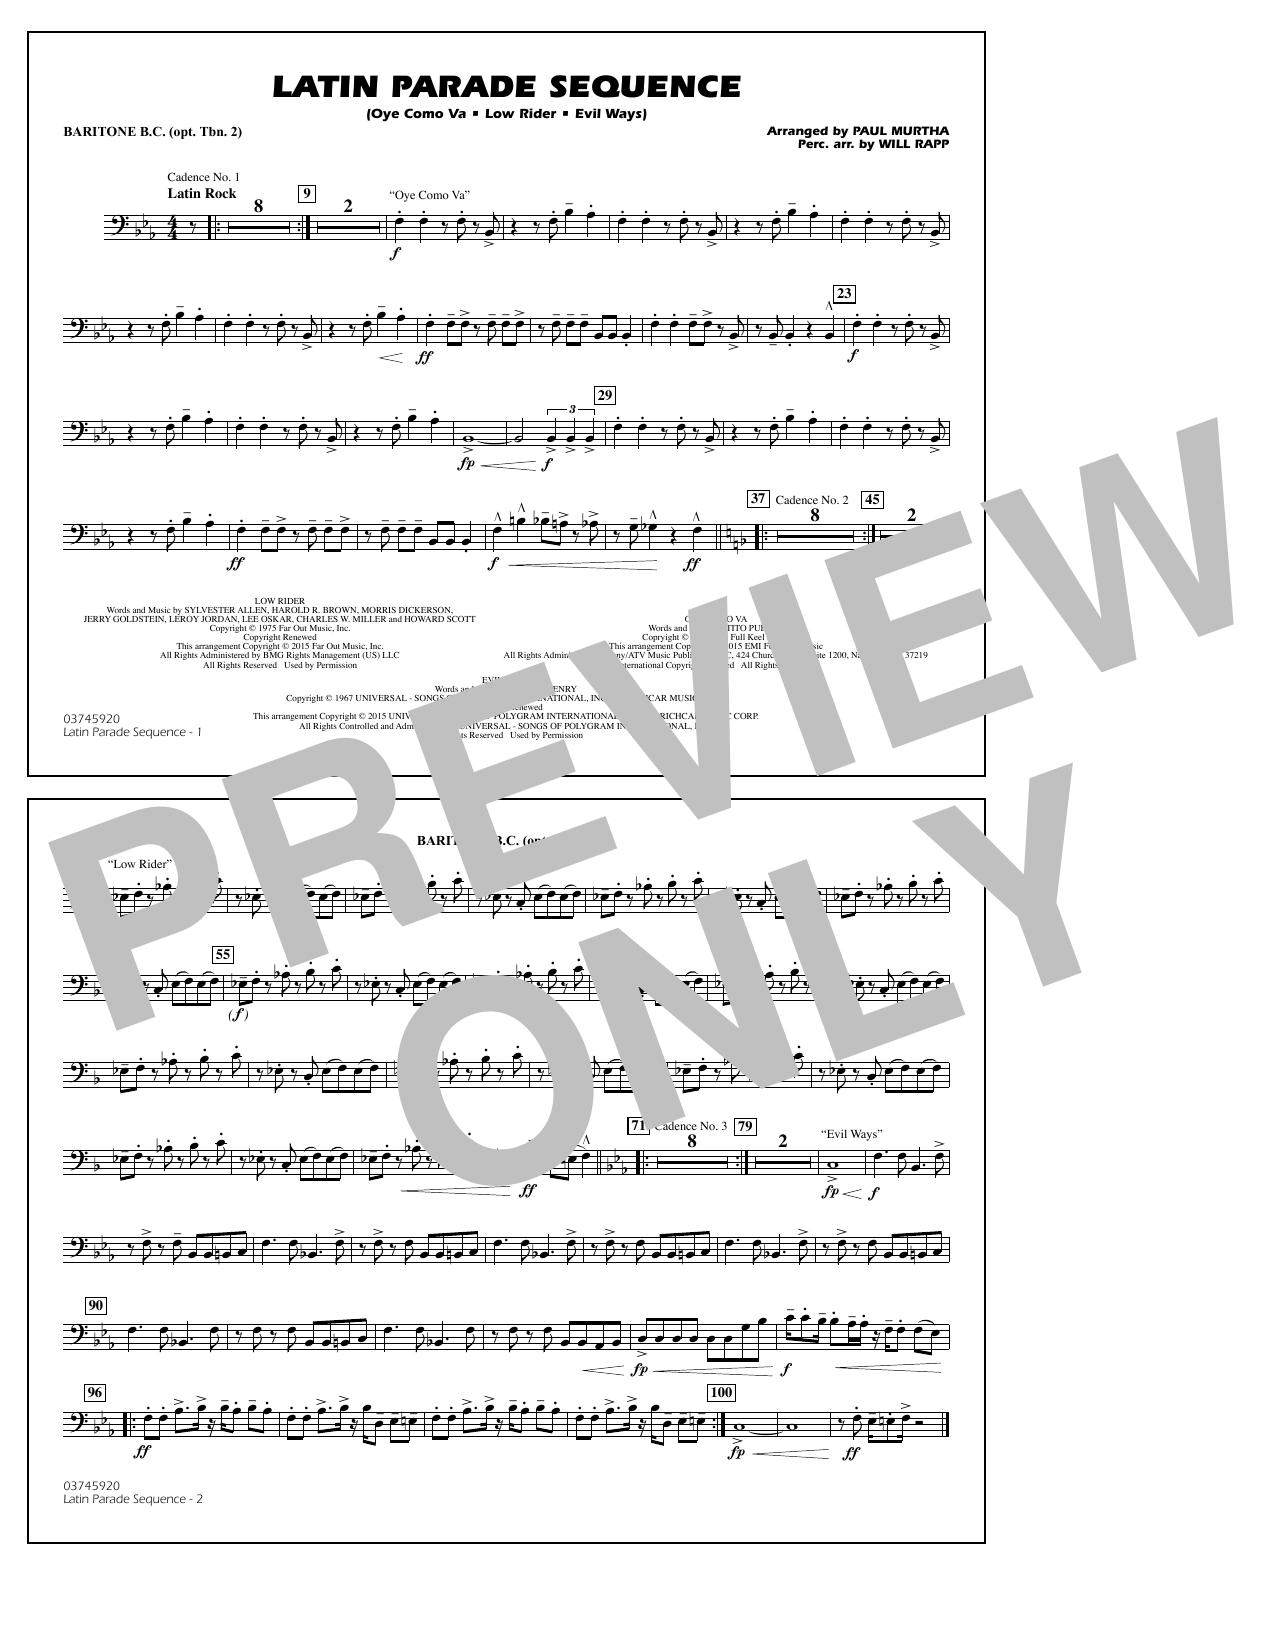 Latin Parade Sequence - Baritone B.C. (Opt. Tbn. 2) (Marching Band)